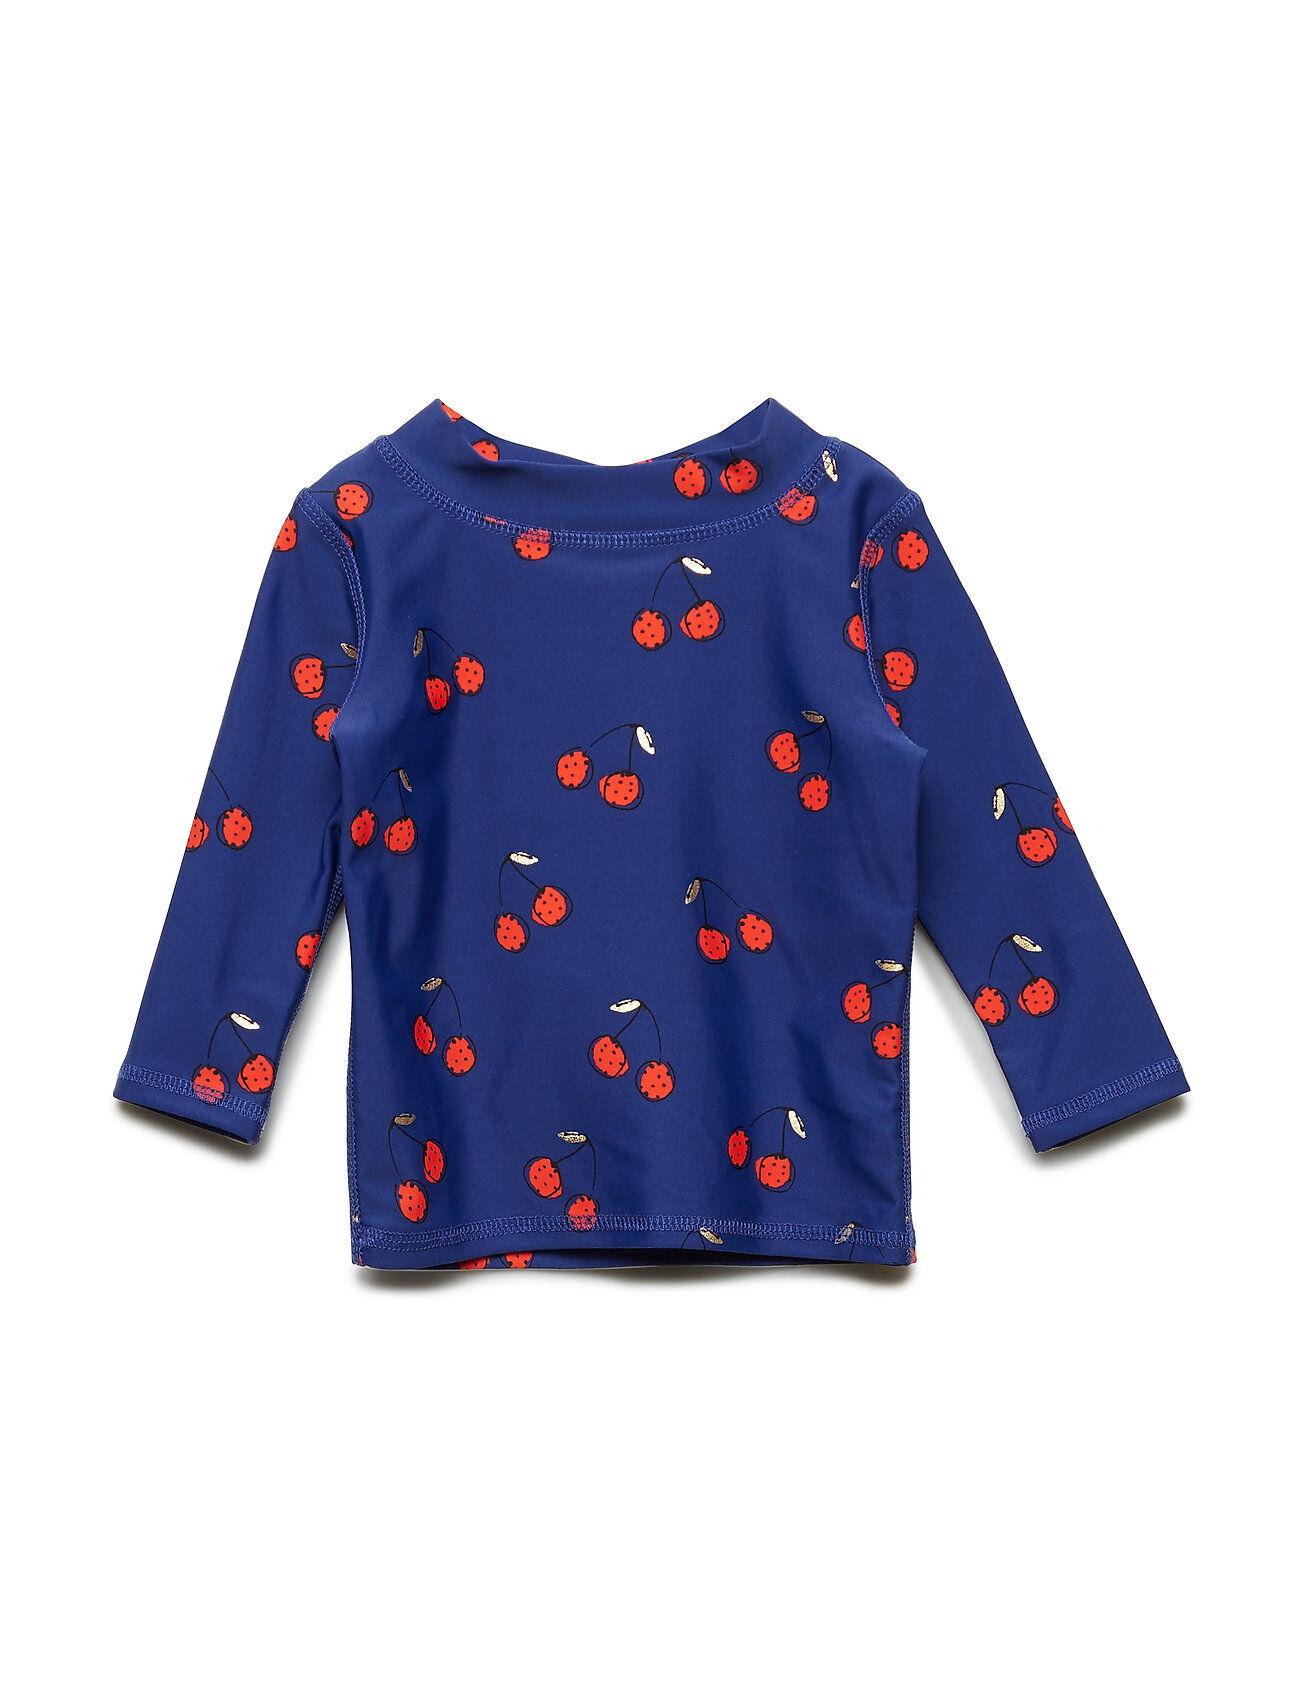 Image of Soft Gallery Baby Astin Sun Shirt Swimwear UV Clothing UV Suits Sininen Soft Gallery